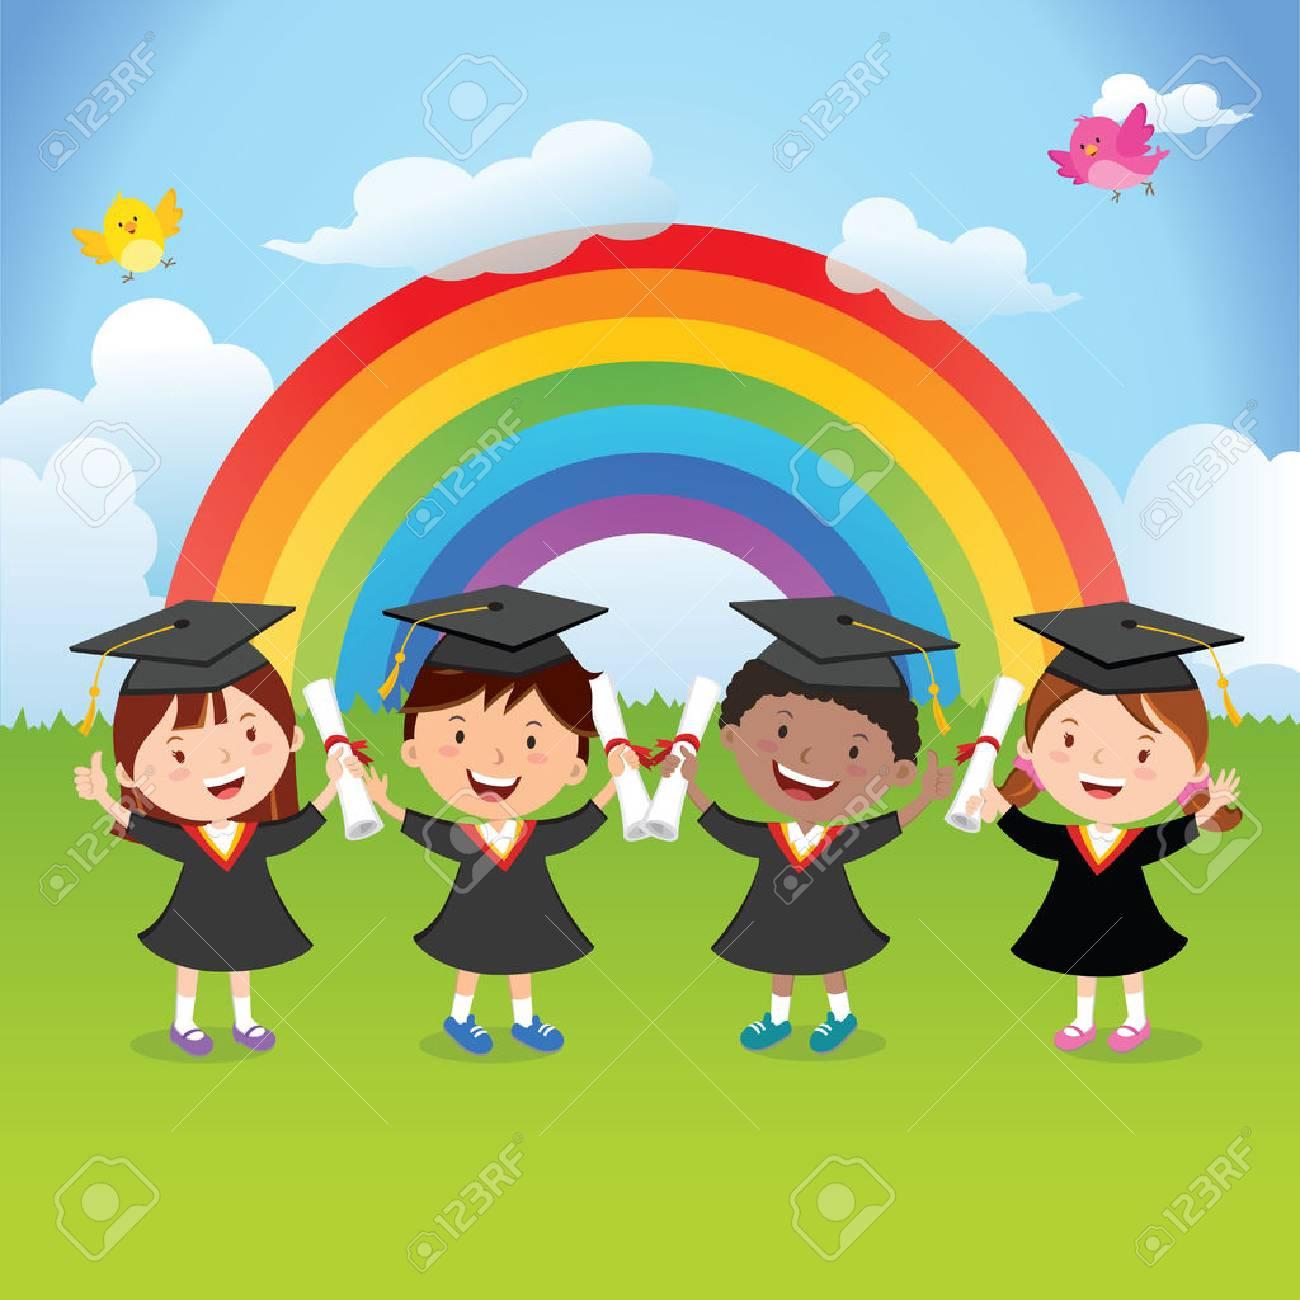 Happy graduation kids with rainbow - 77470497